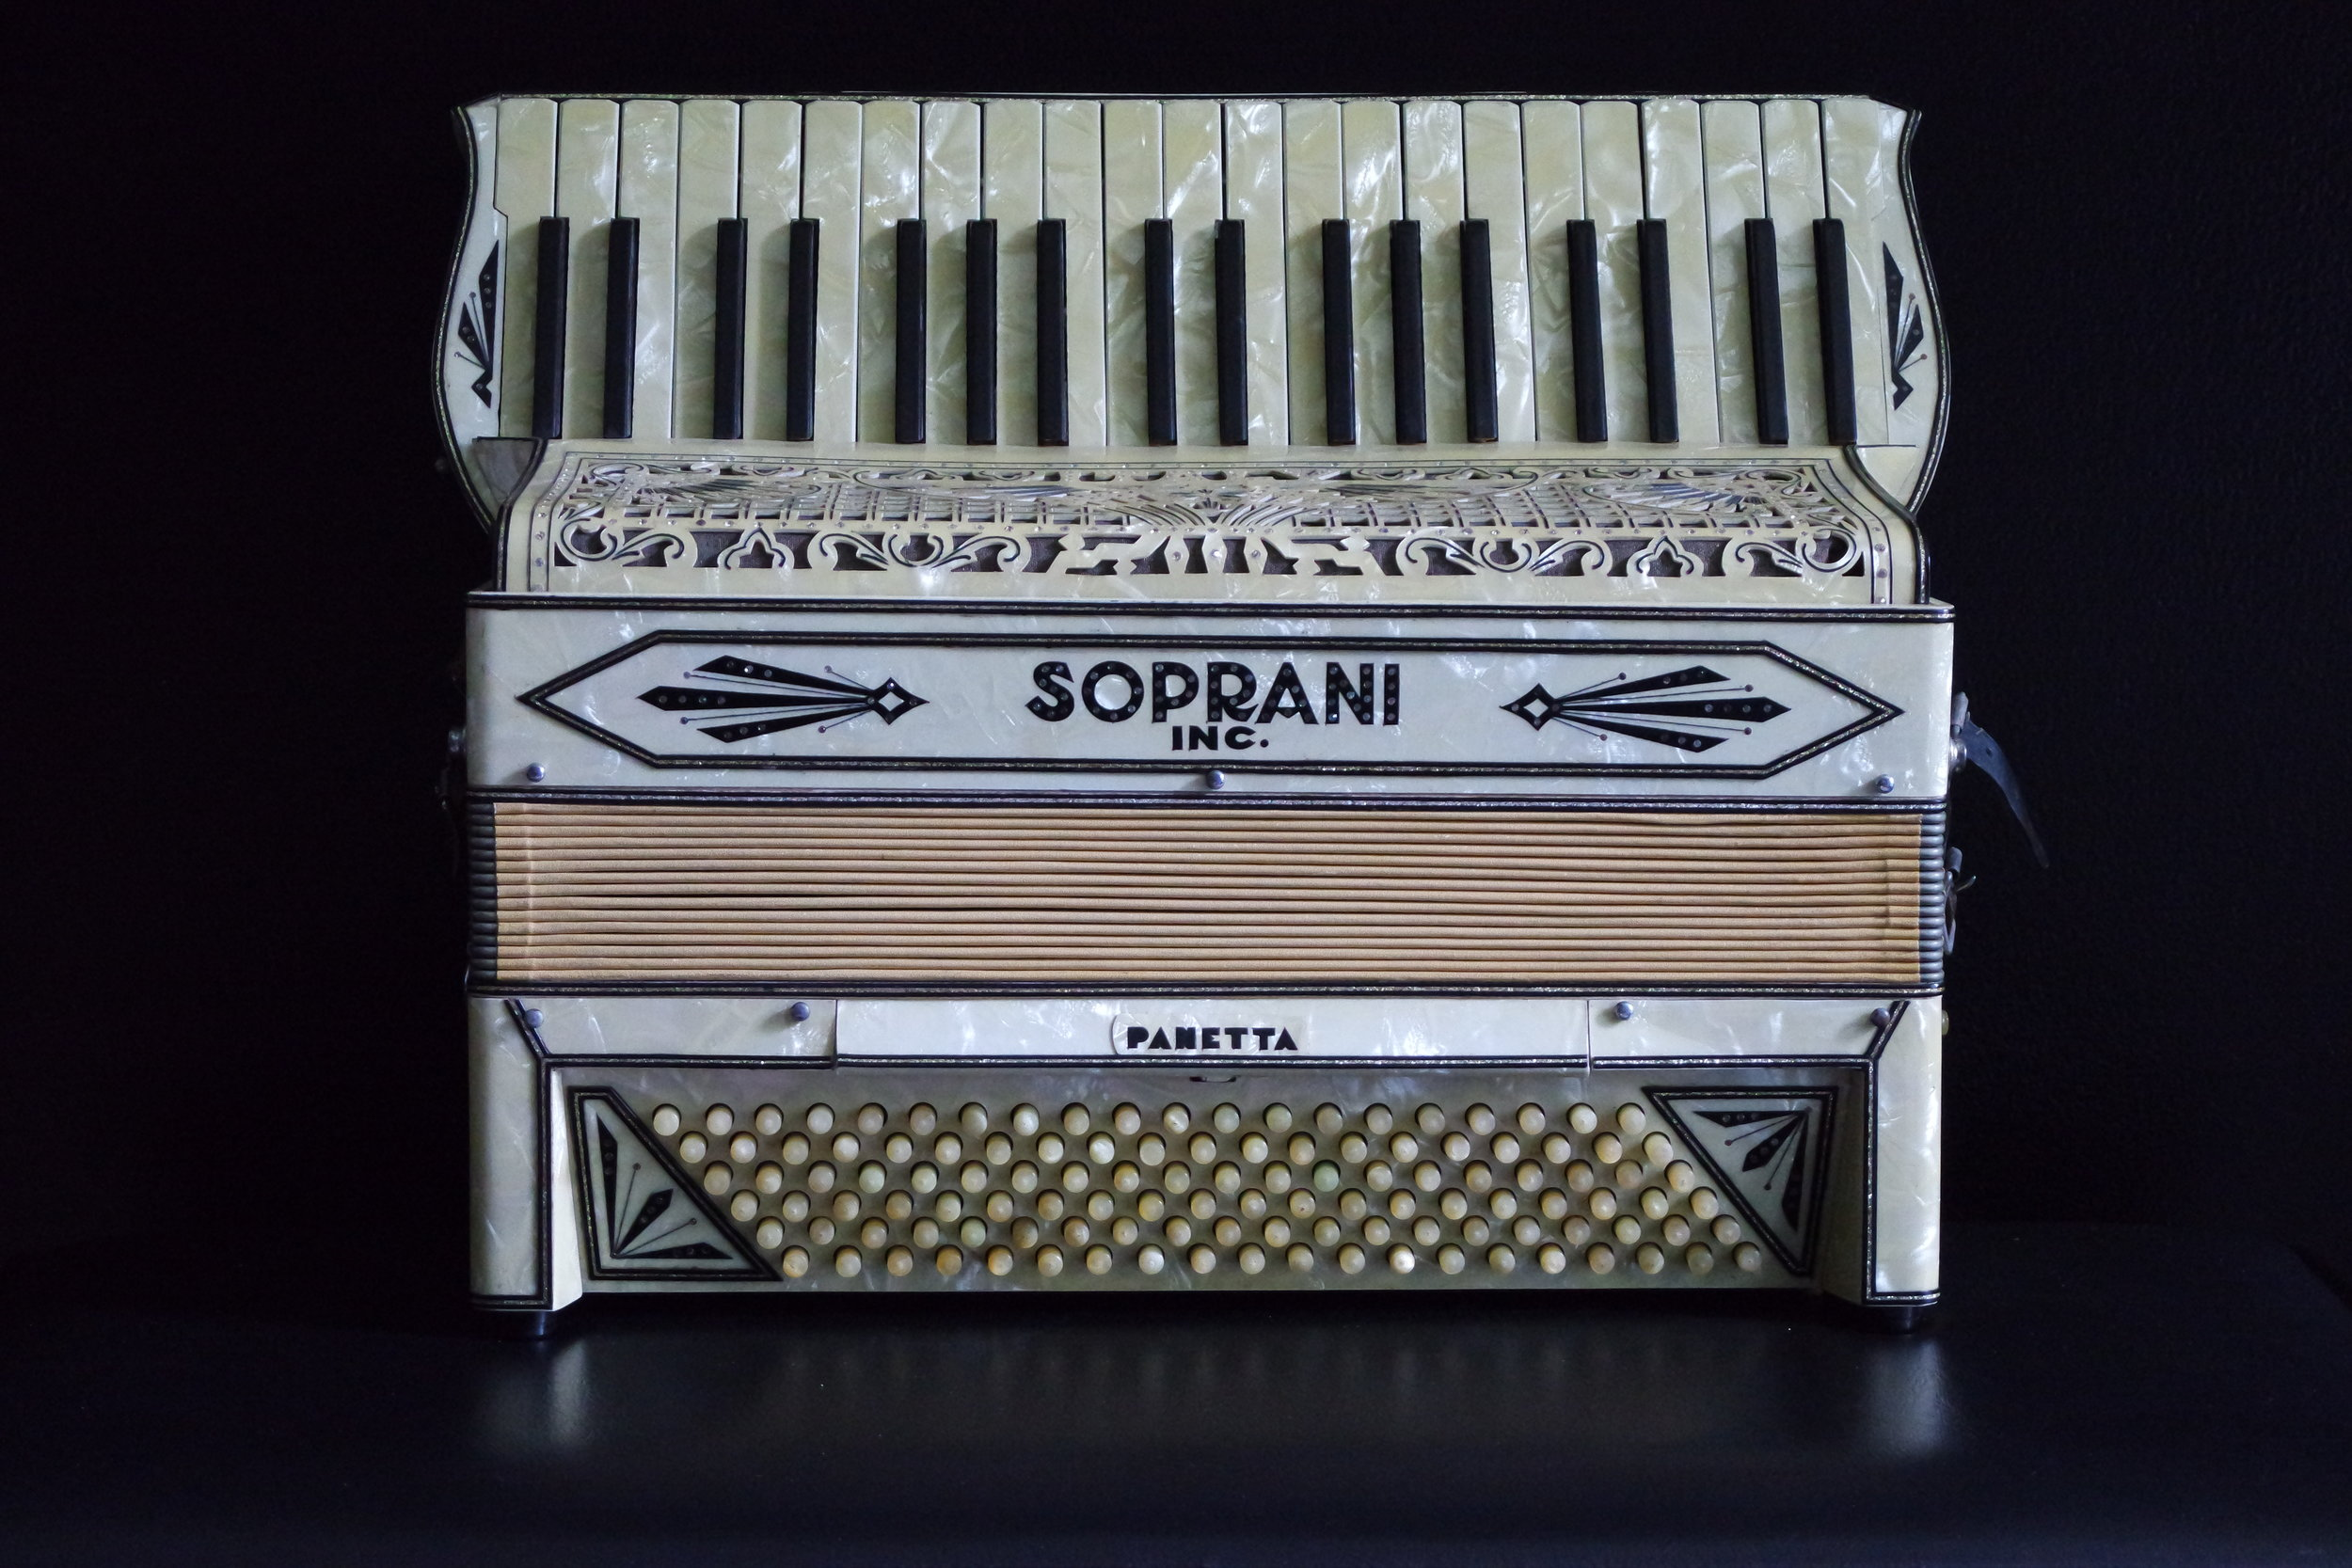 soprani_panetta_accordion_1.JPG